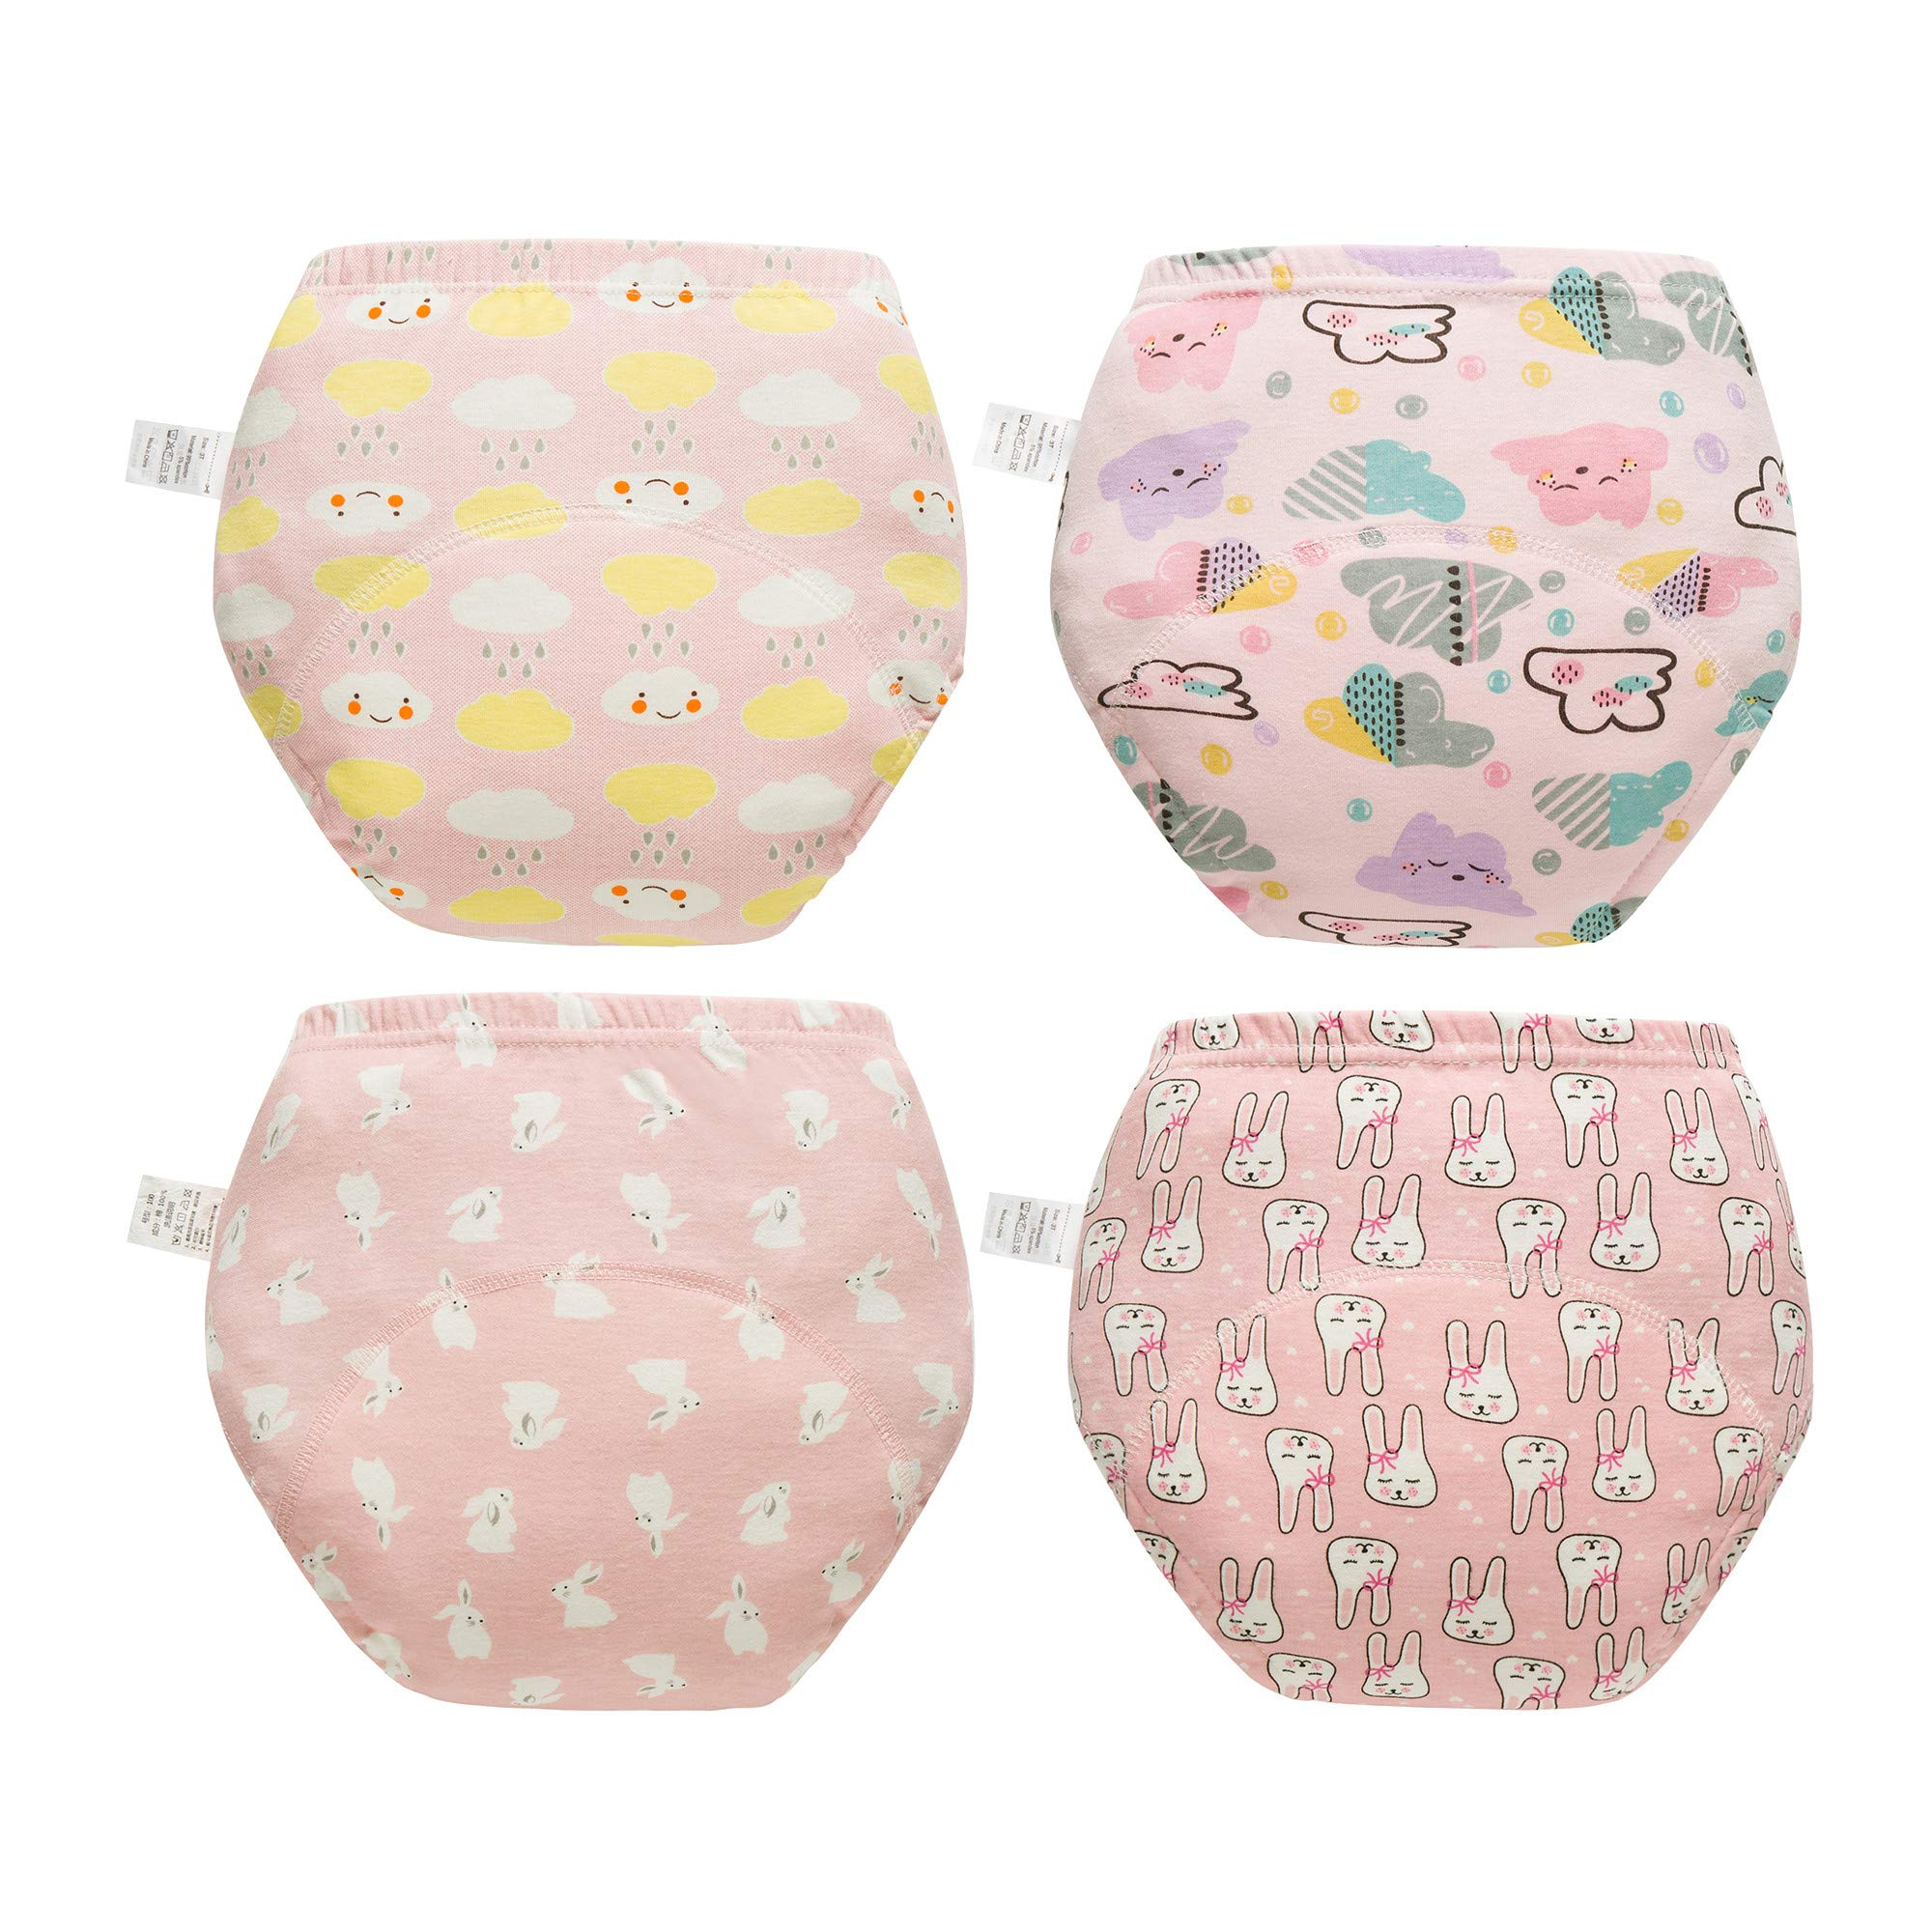 Skhls Unisex Baby Cotton Padded Potty Anti Leakage Training Pant 4 Pack 2T-4T